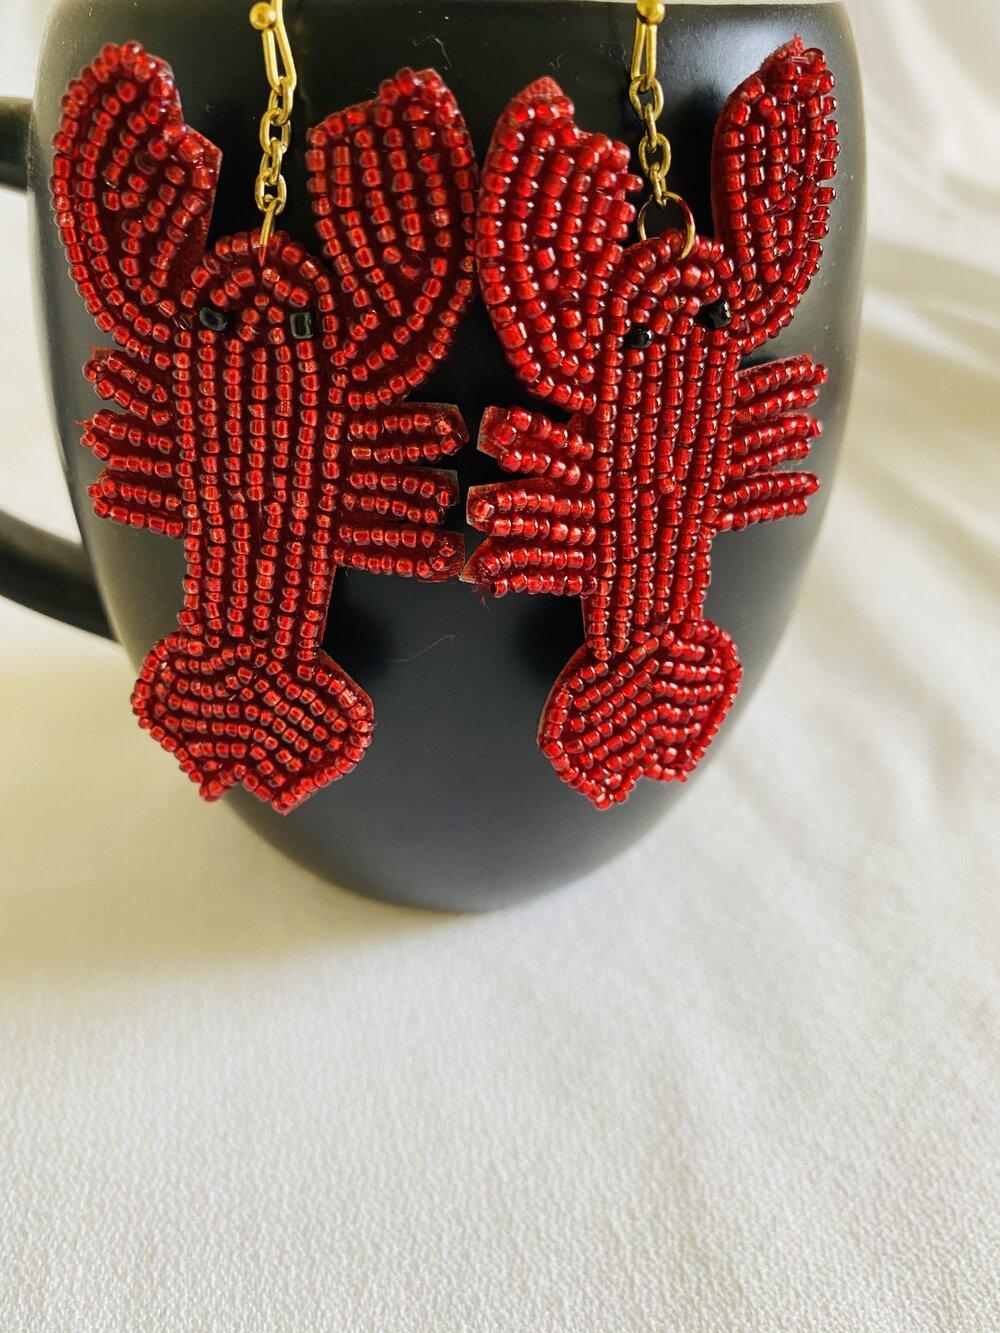 Southern Jewelry Cajun Jewelry Crystal Crawfish Earrings Louisiana Jewelry Crawfish Jewelry Crawfish Earrings